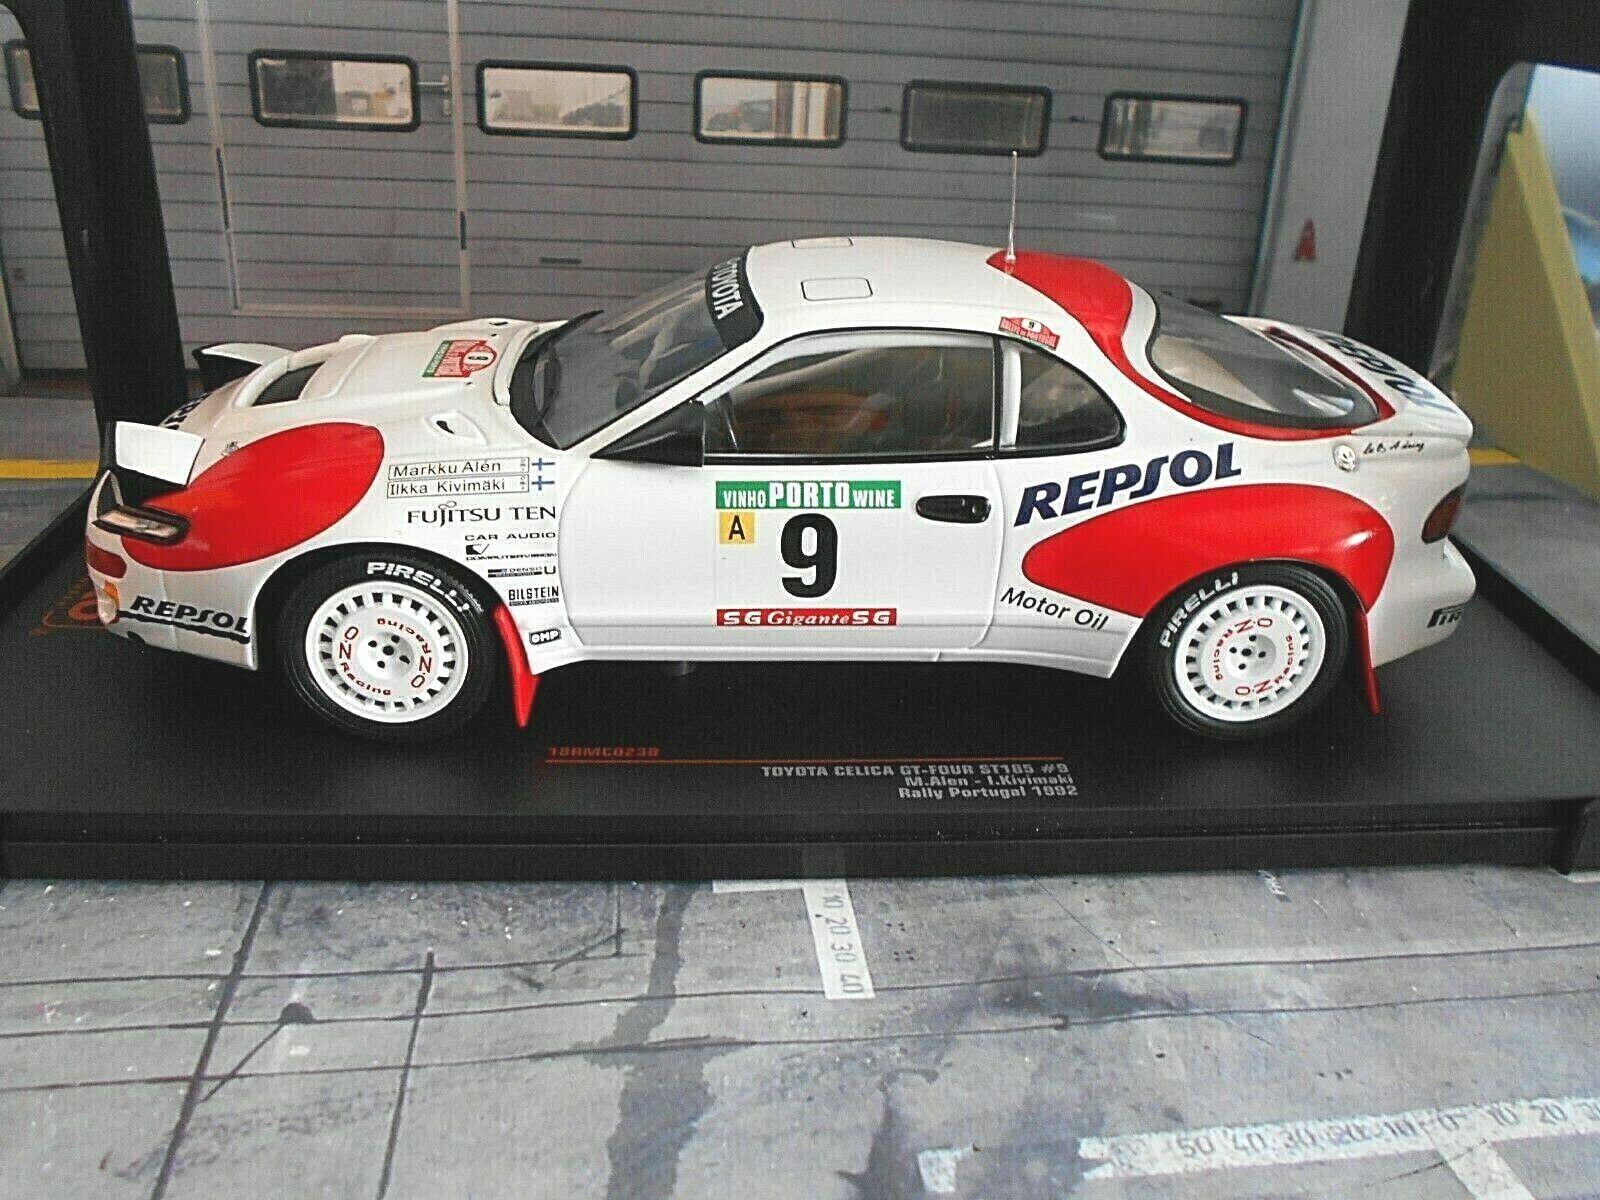 Toyota celica st185 Rallye Portugal 1992  9 Alen Kivimäki Repsol IXO NEUF 1 18